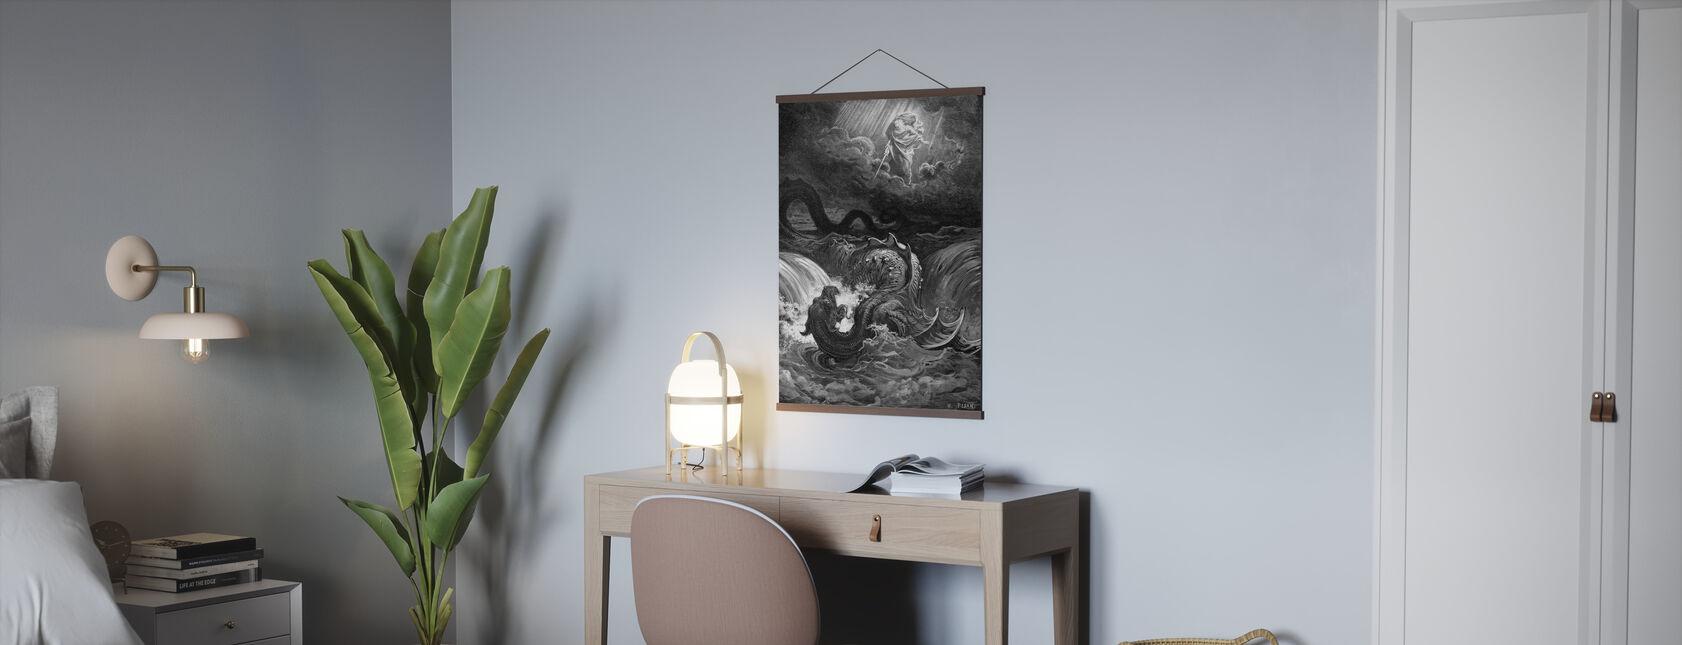 Esaias Syn - Gustave Dore - Plakat - Kontor